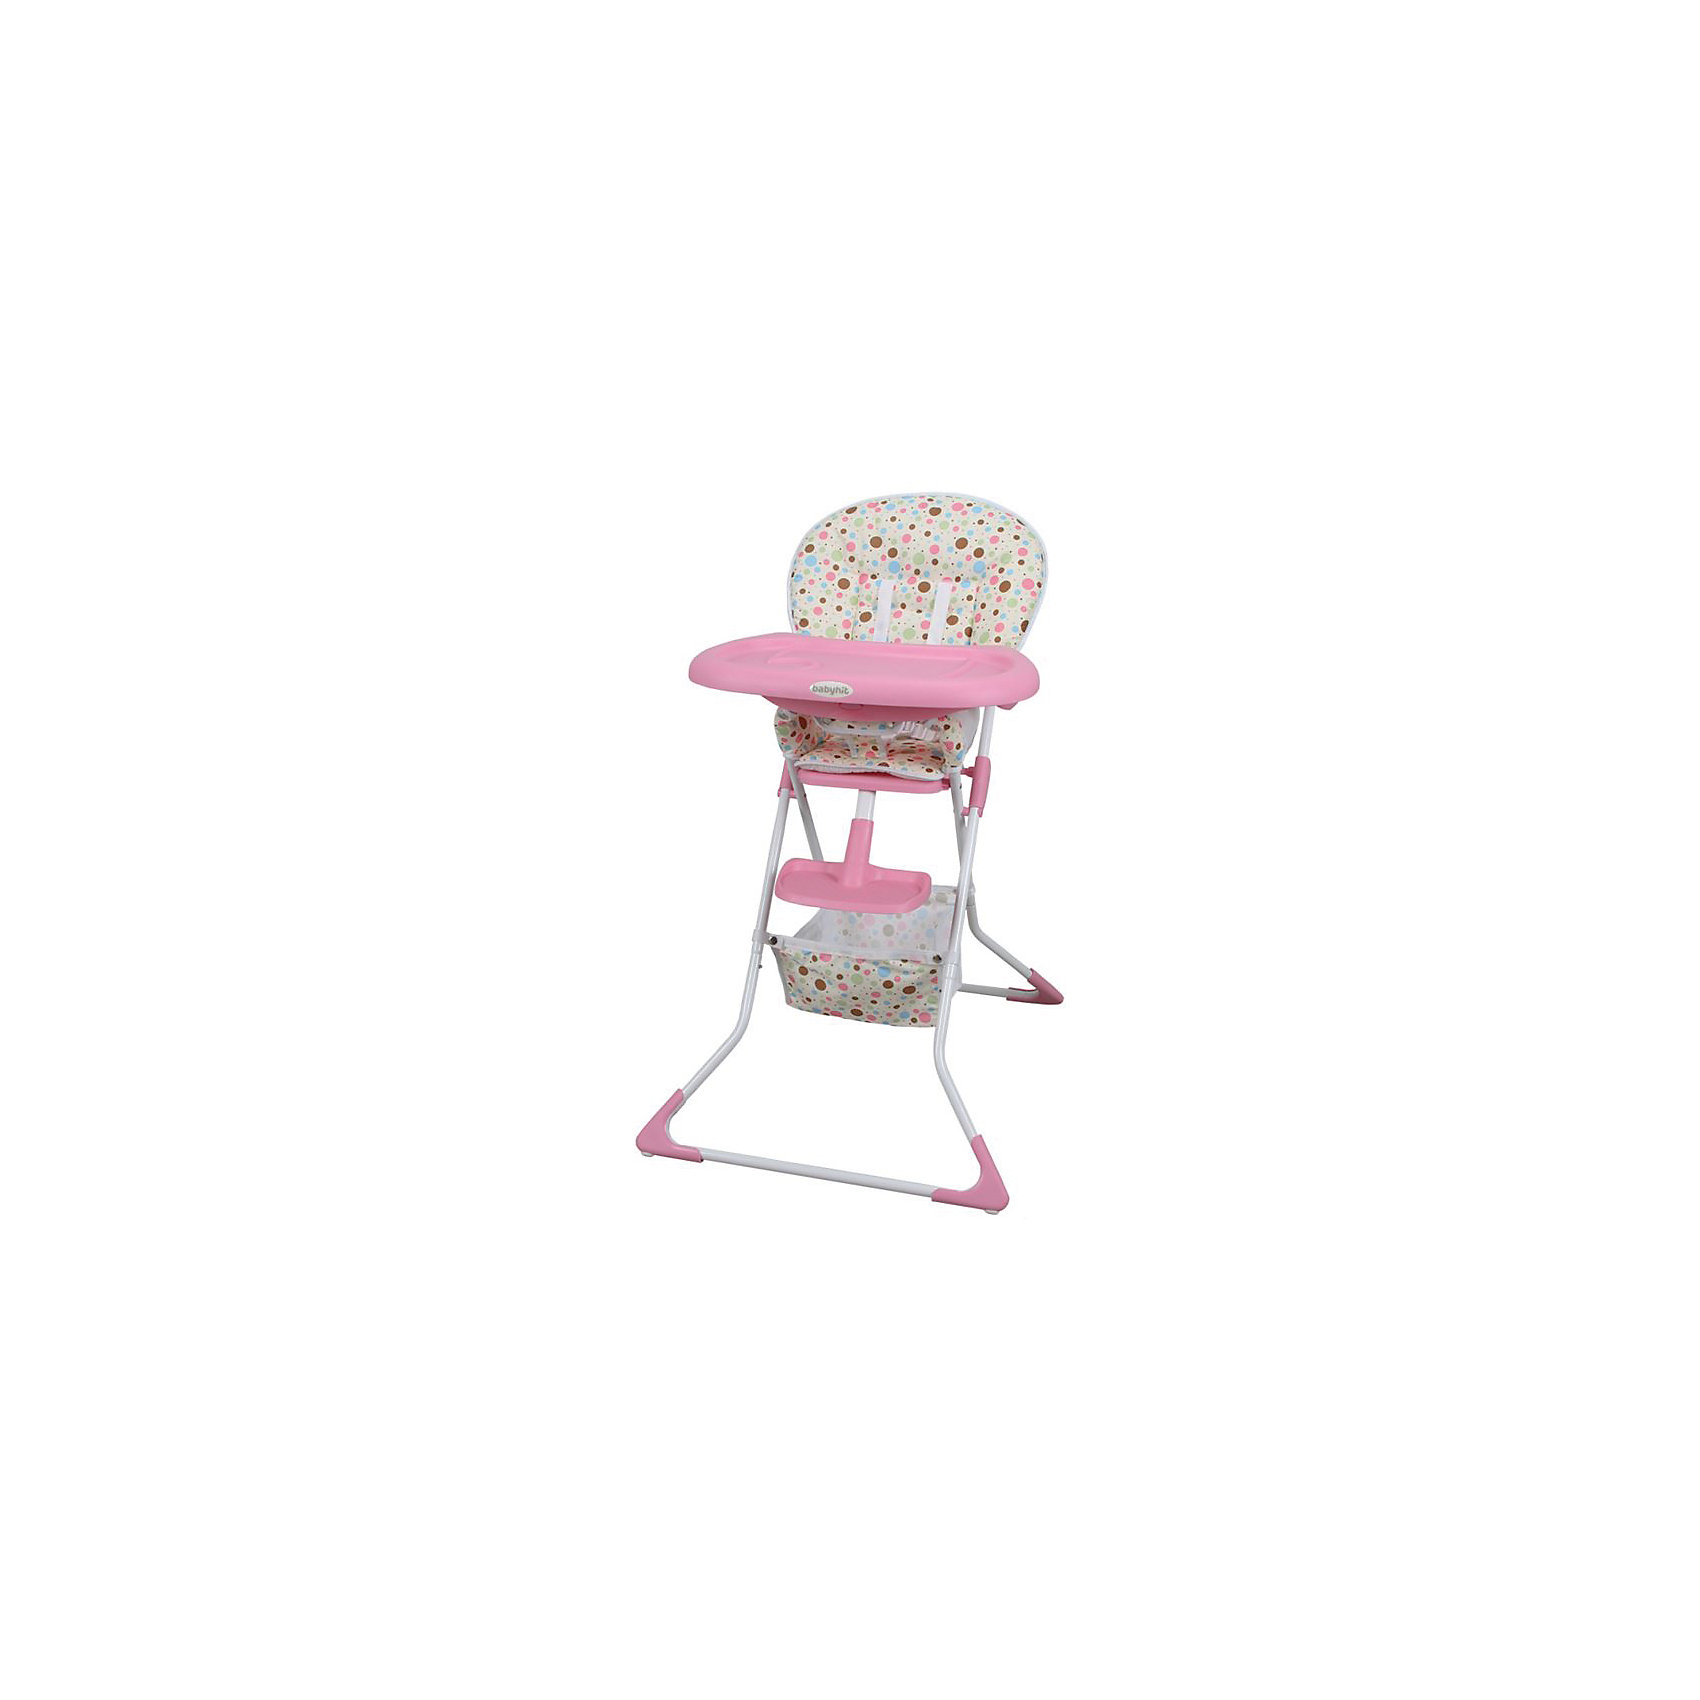 Стульчик для кормления TASTY TIME, BabyHit, розовый